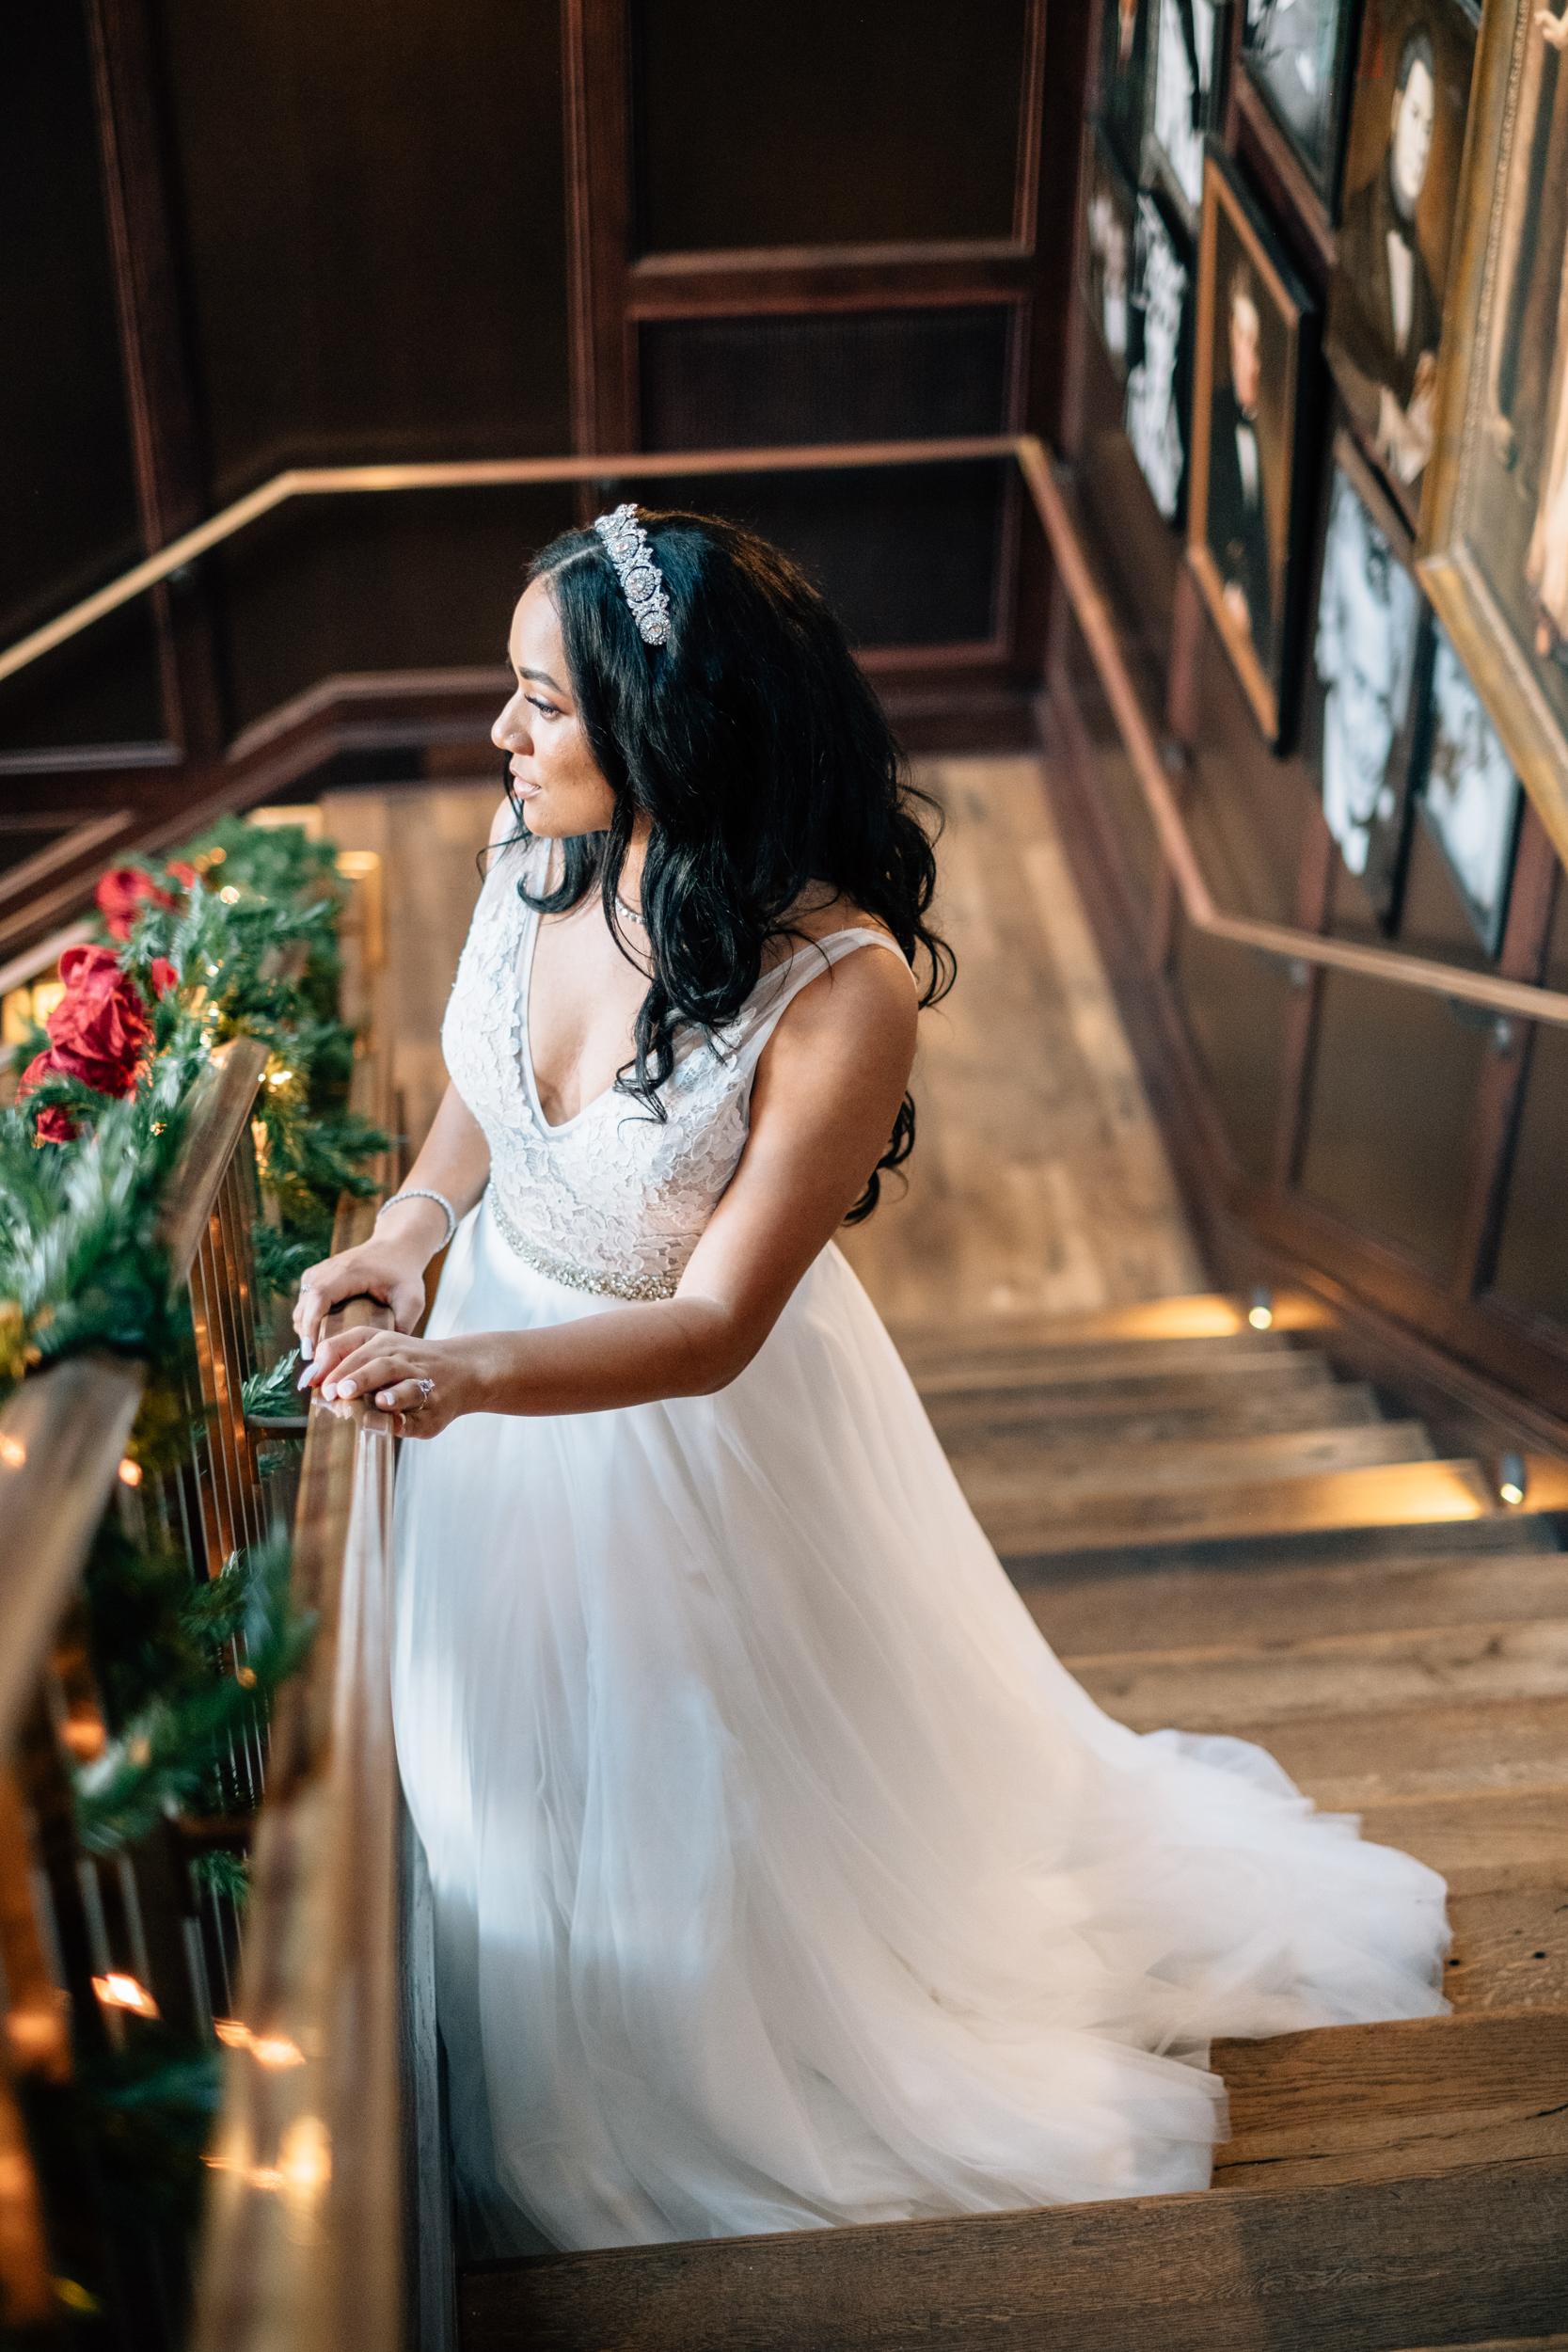 Amethyst Weddings - Erwin & Alondra Preview 009  web.jpg